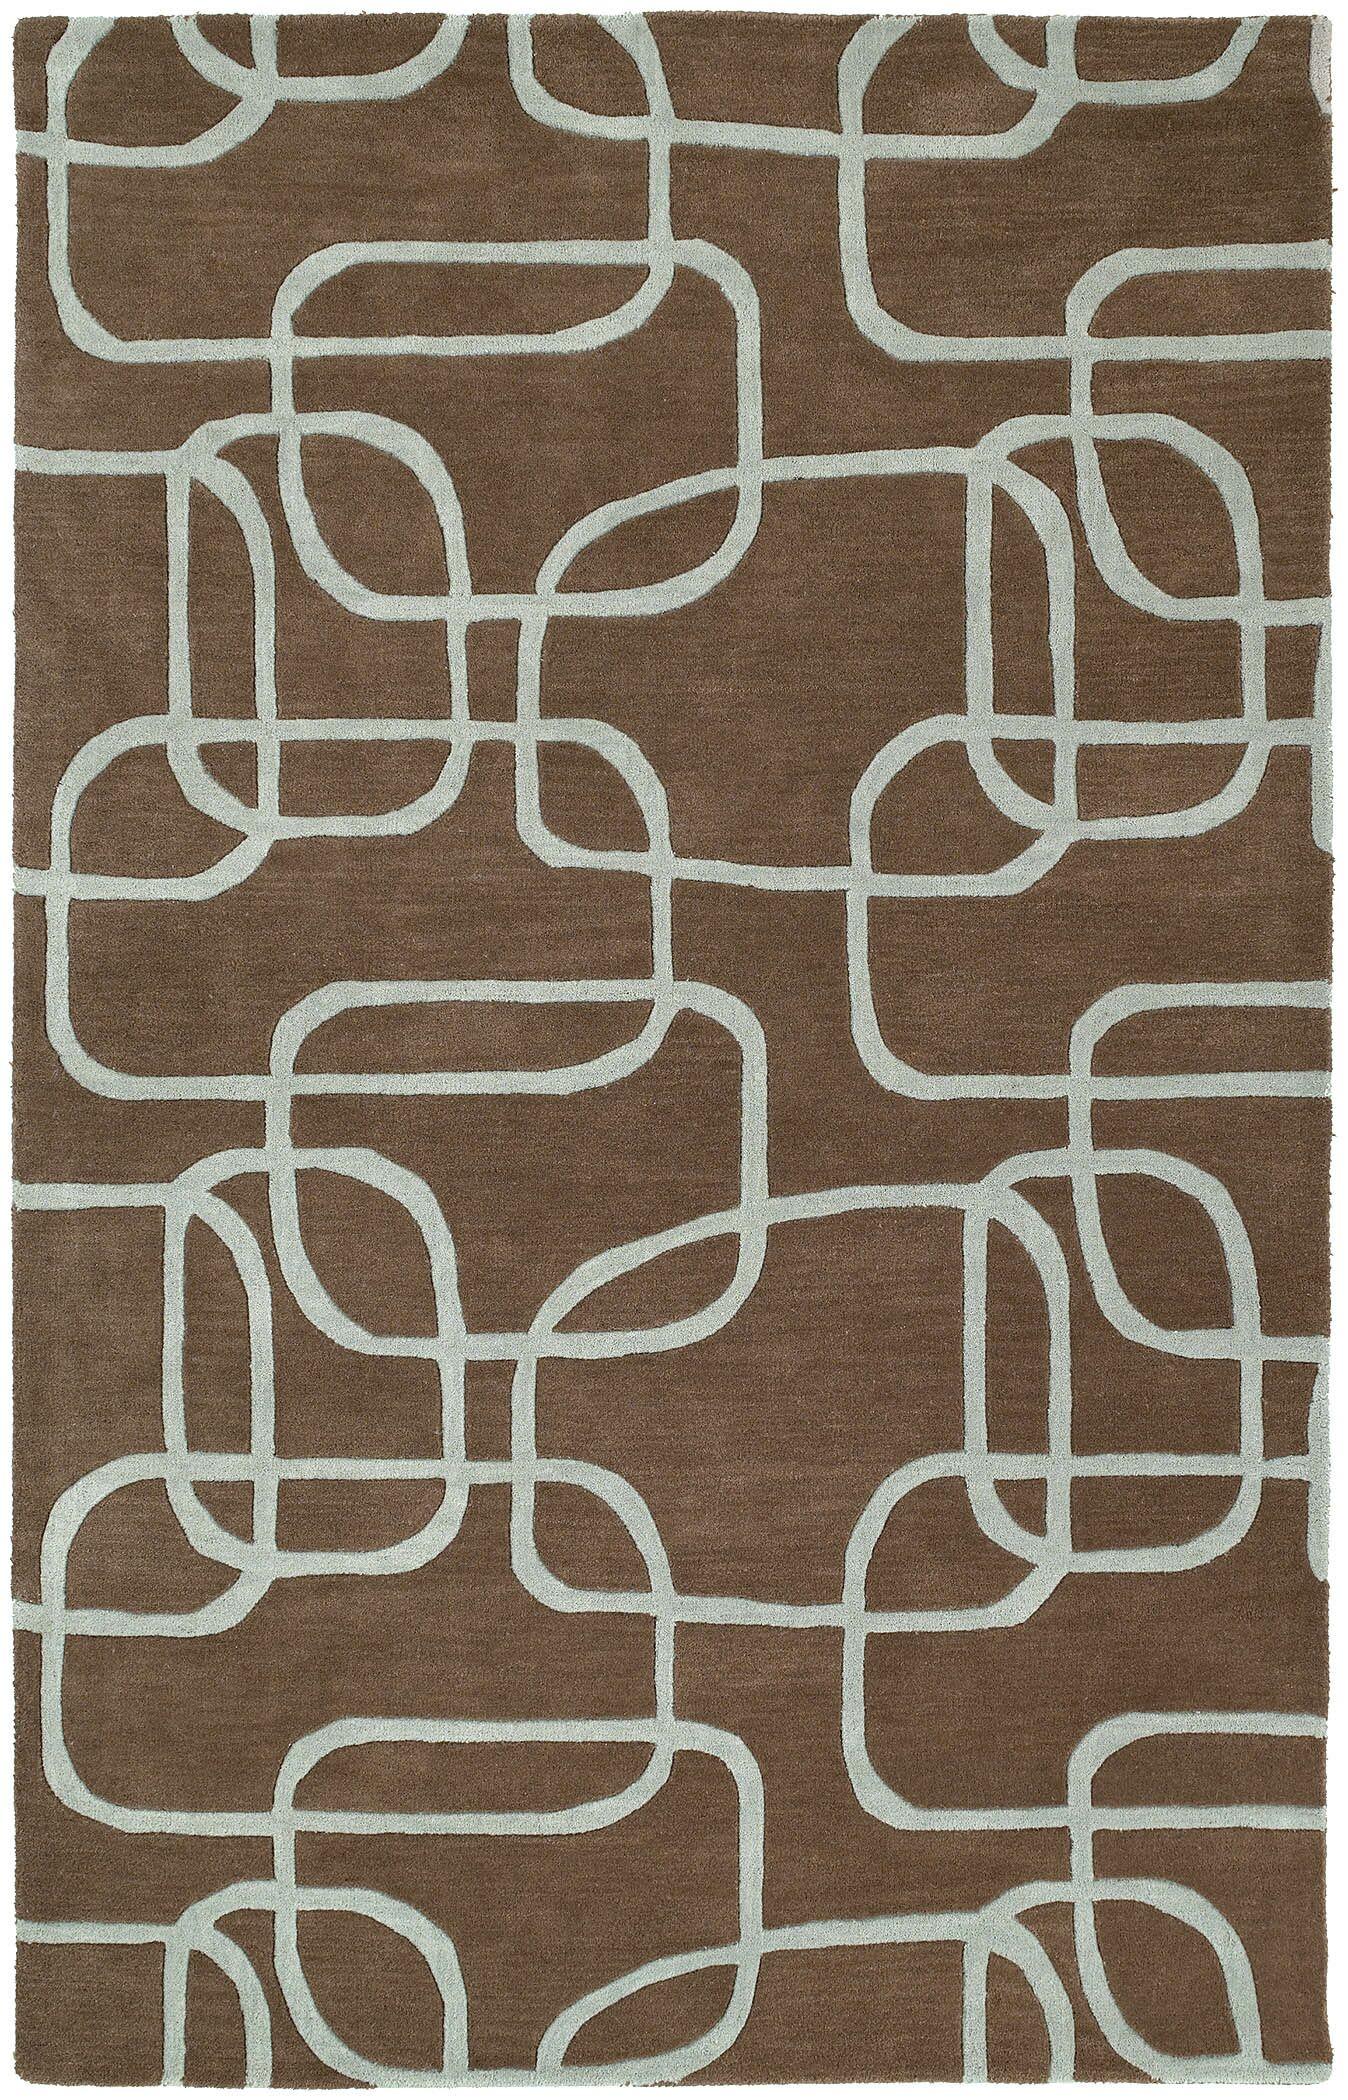 Carter Brown Area Rug Rug Size: Rectangle 5' x 7'9